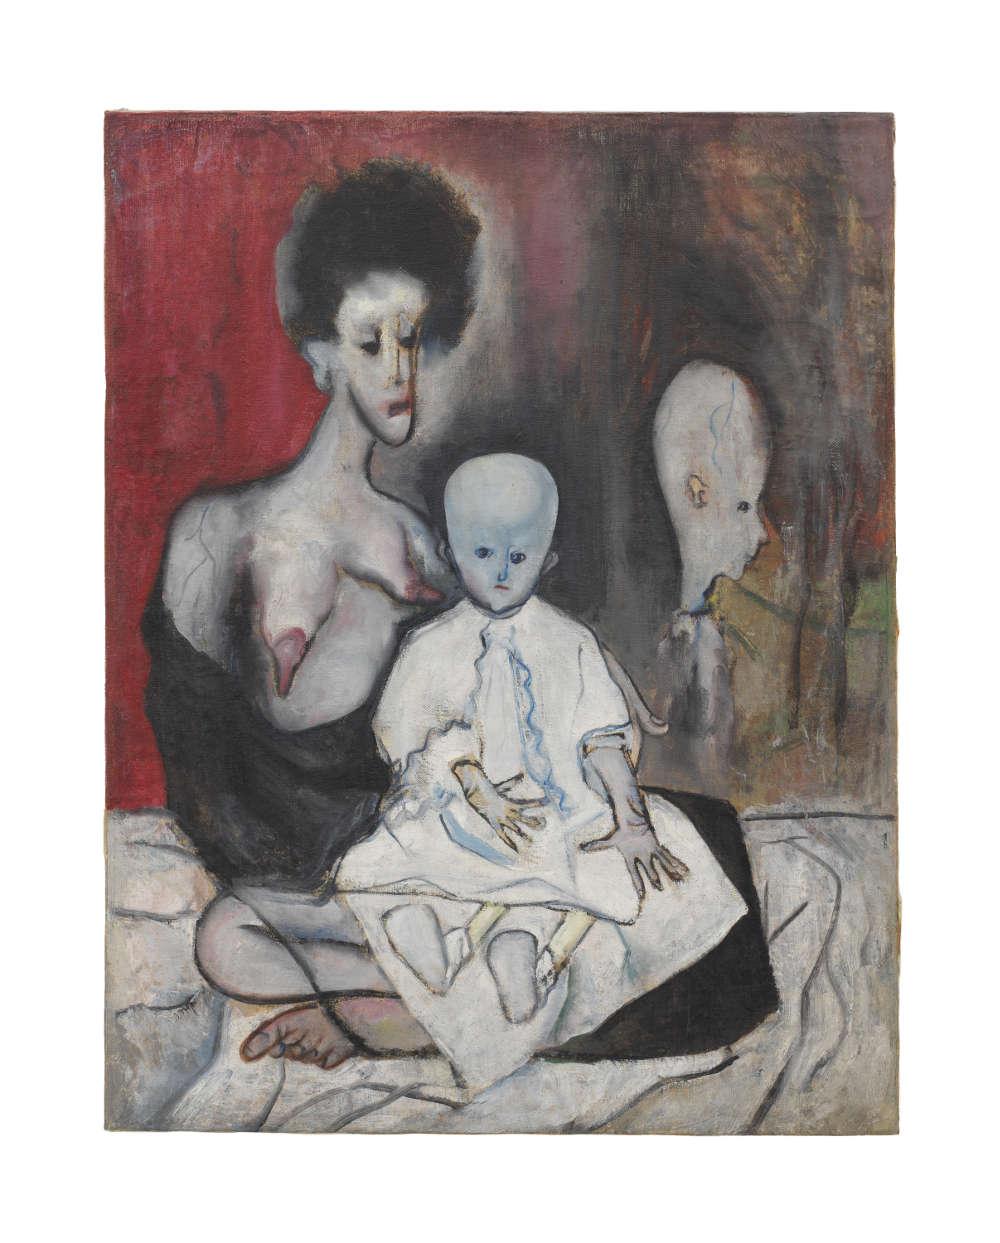 Alice Neel, Degenerate Madonna, 1930. The Estate of Alice Neel. Courtesy The Estate of Alice Neel and David Zwirner © The Estate of Alice Neel